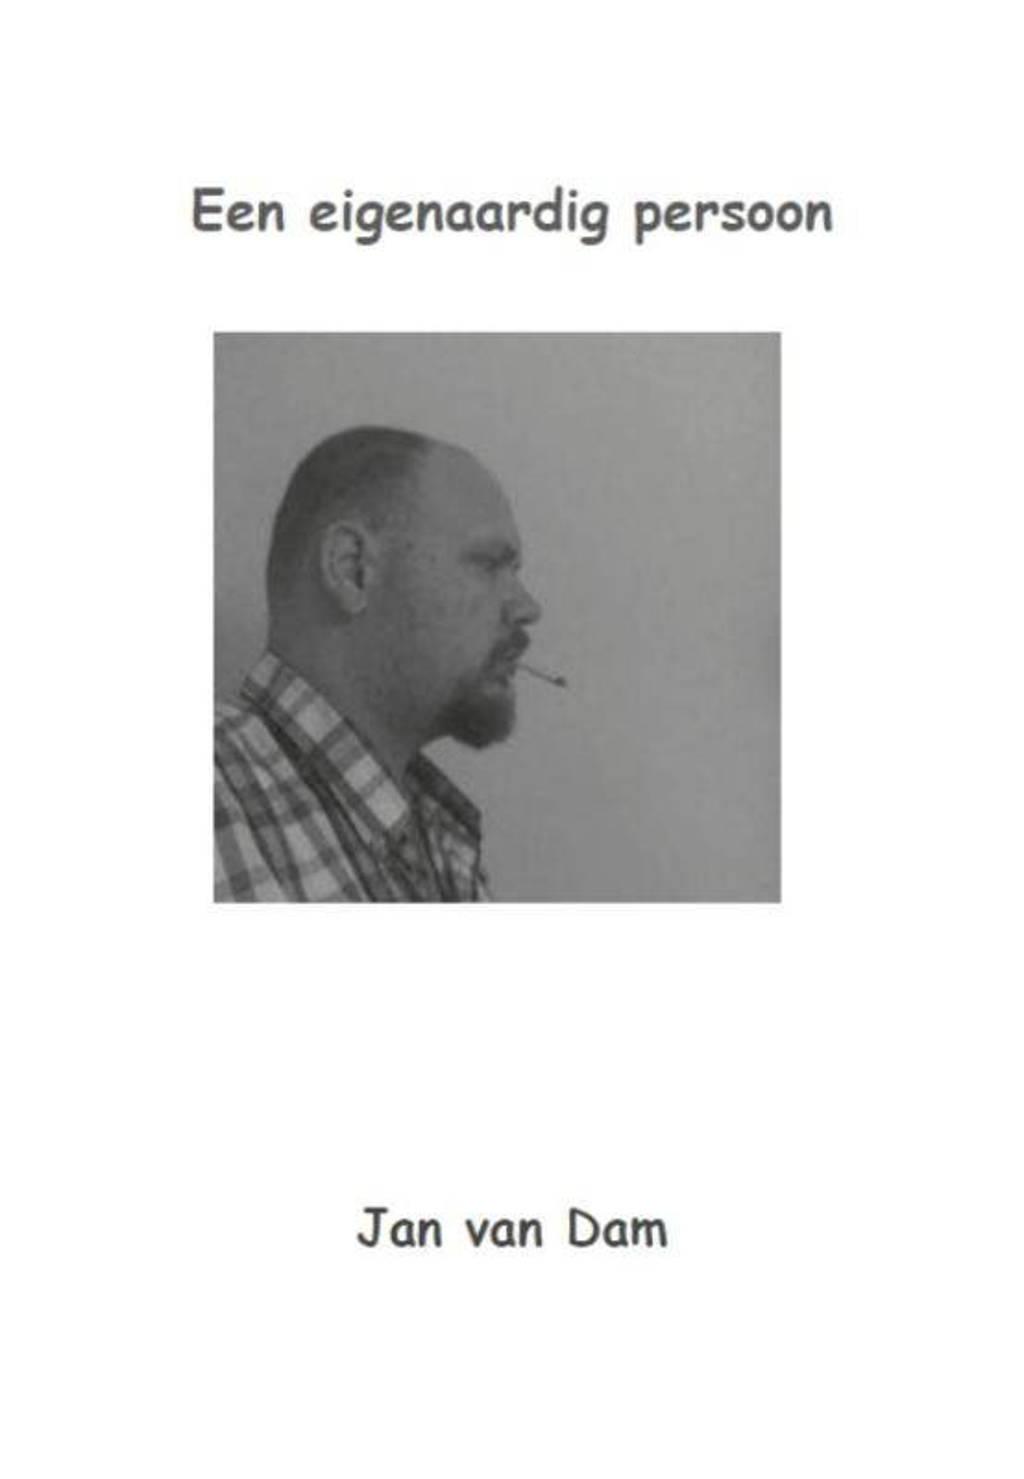 Eigenaardig persoon - Jan van Dam